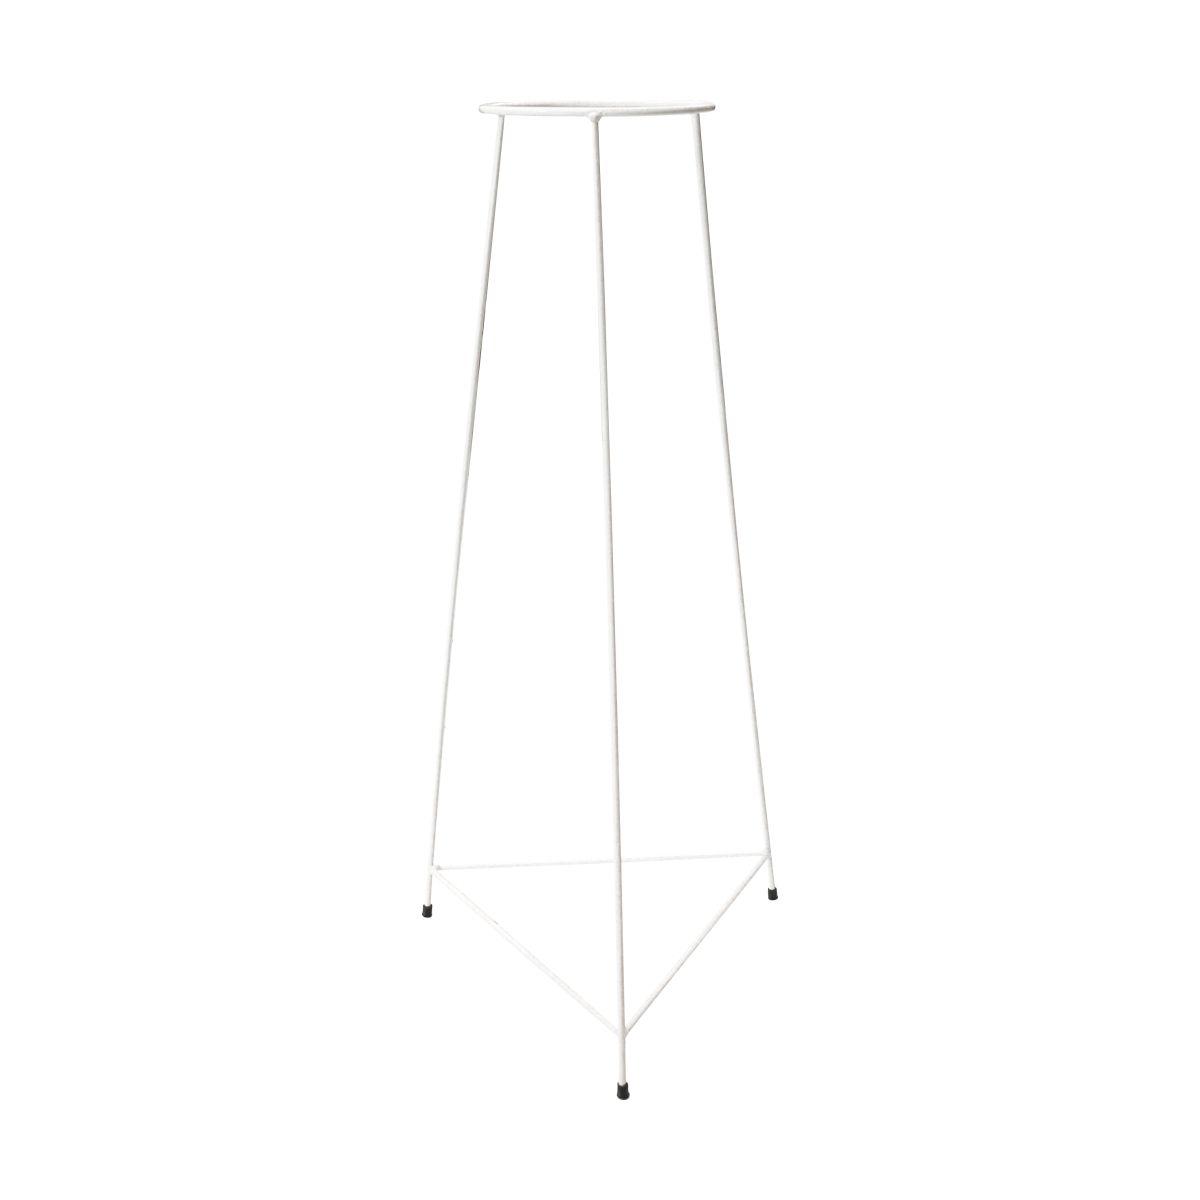 Suporte Tripé Triangular Branco 70cm para Vaso Autoirigável Grande N04 Raiz